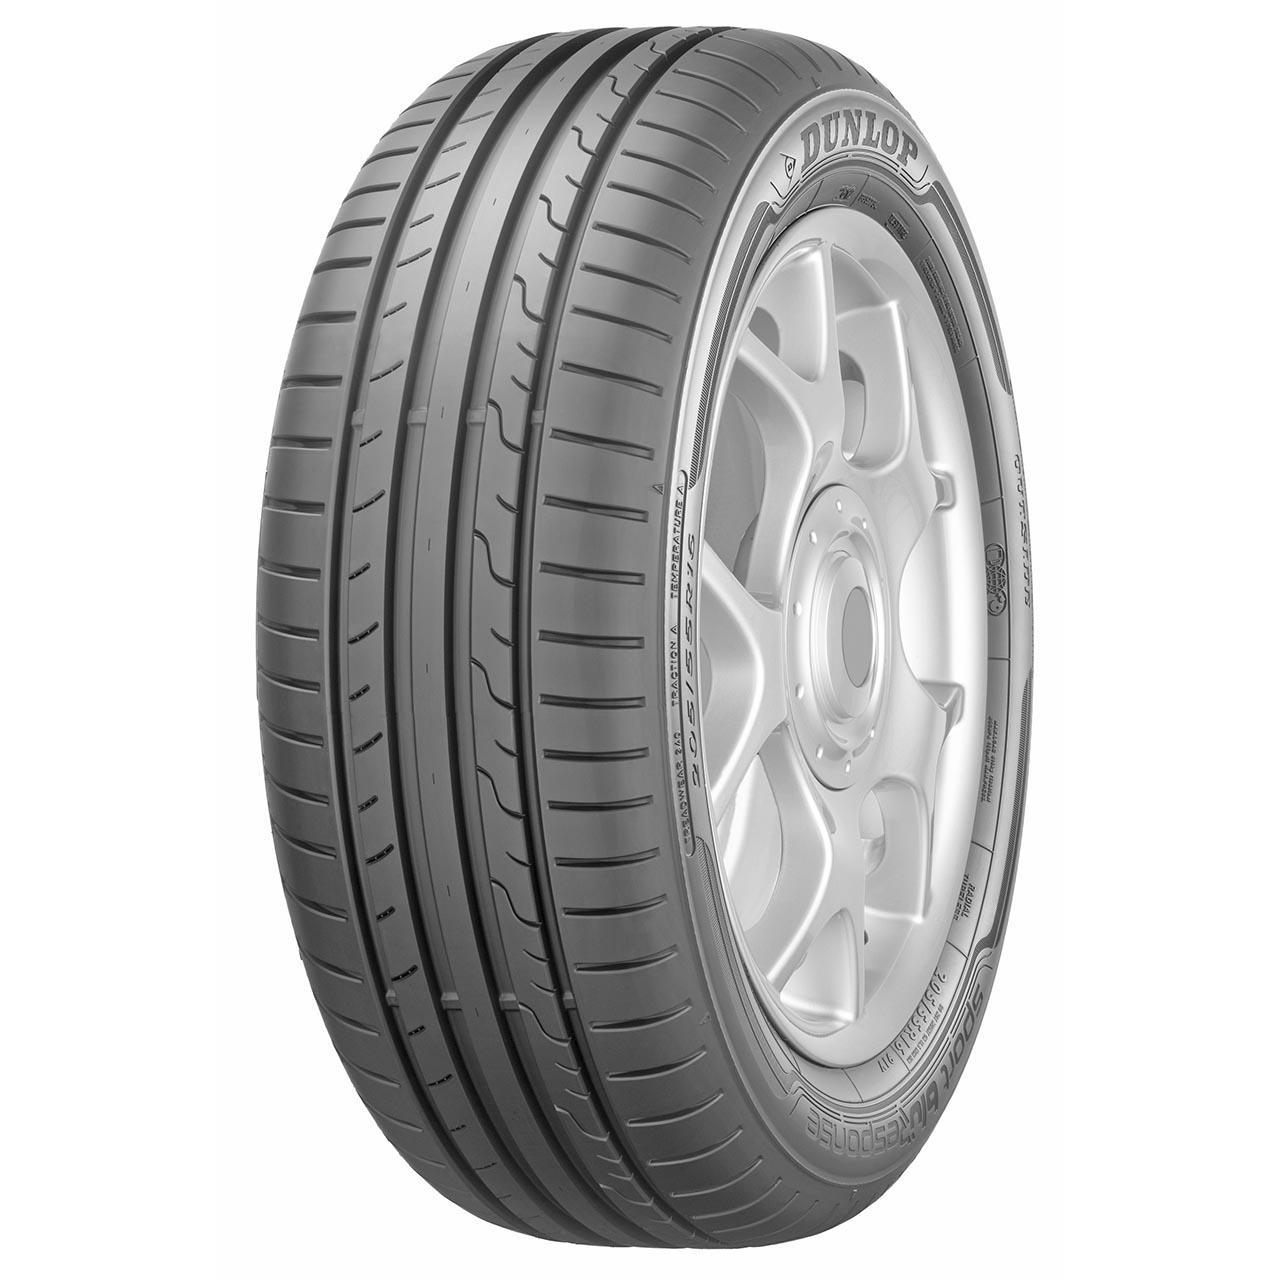 Dunlop Sport Bluresponse 225/45R17 94W XL MFS